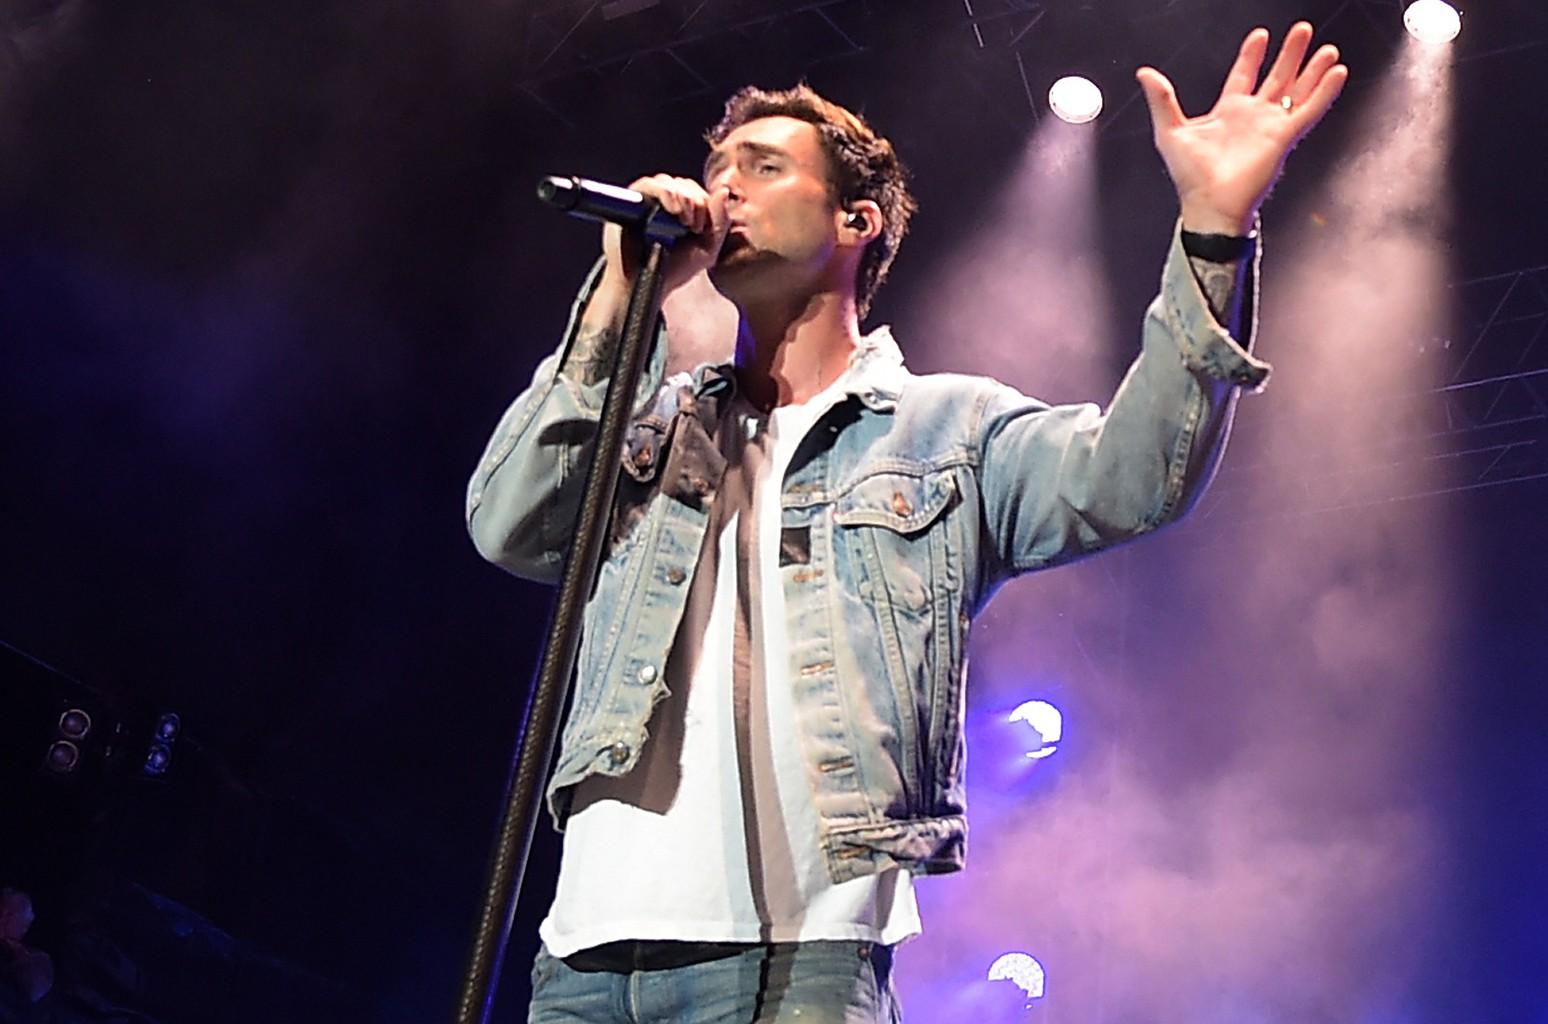 Adam Levine of Maroon 5 performs in 2016